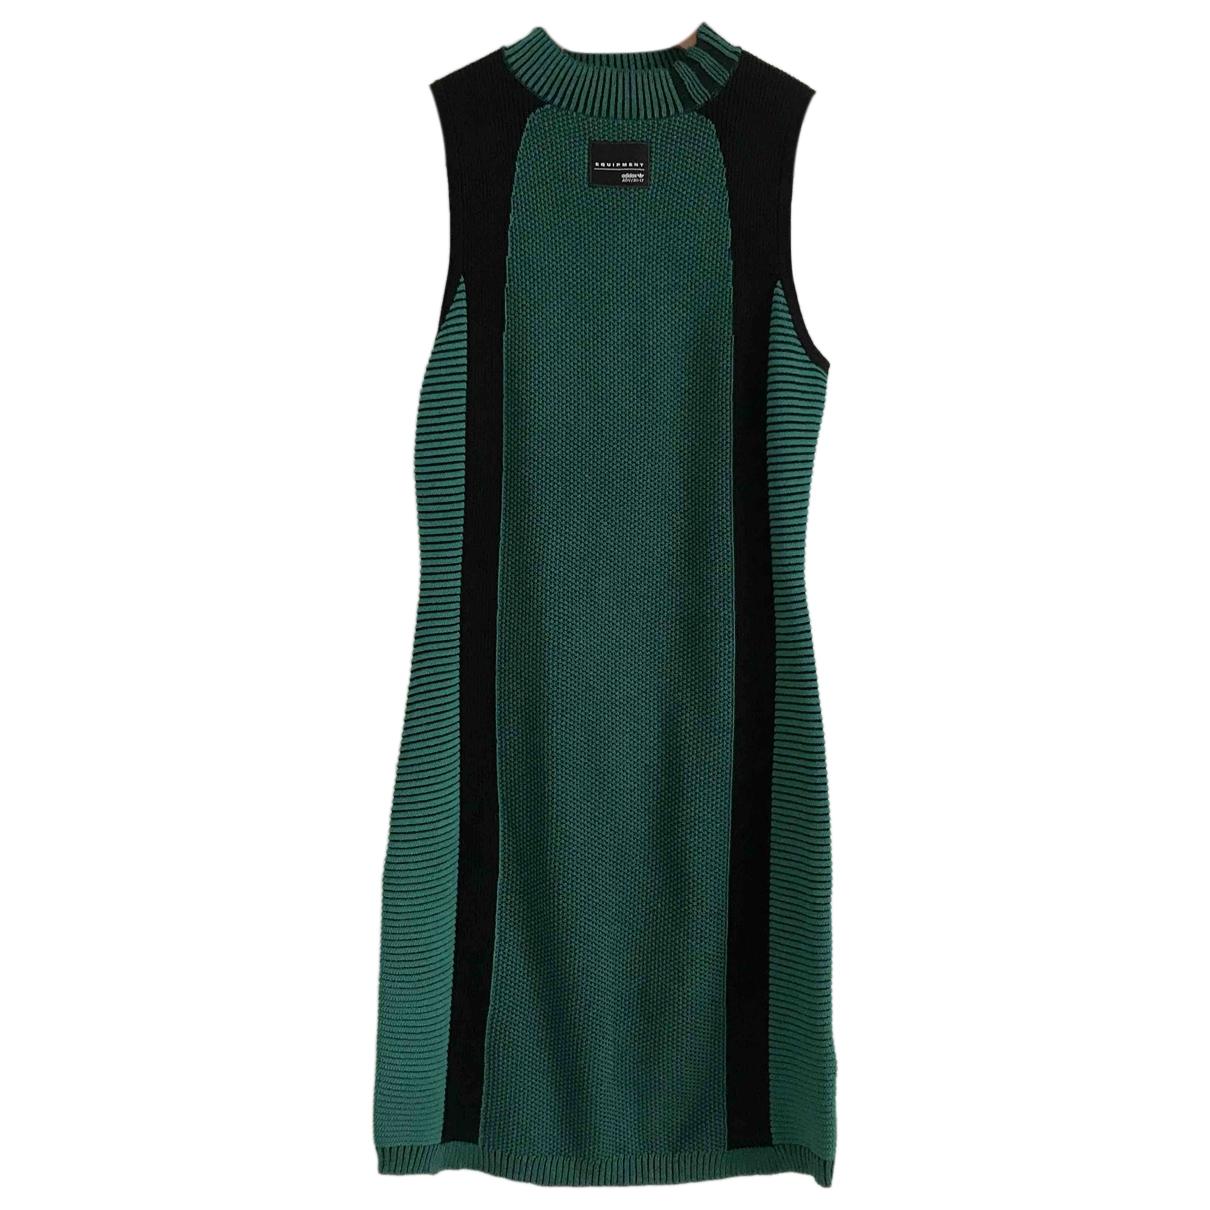 Adidas - Robe   pour femme - vert